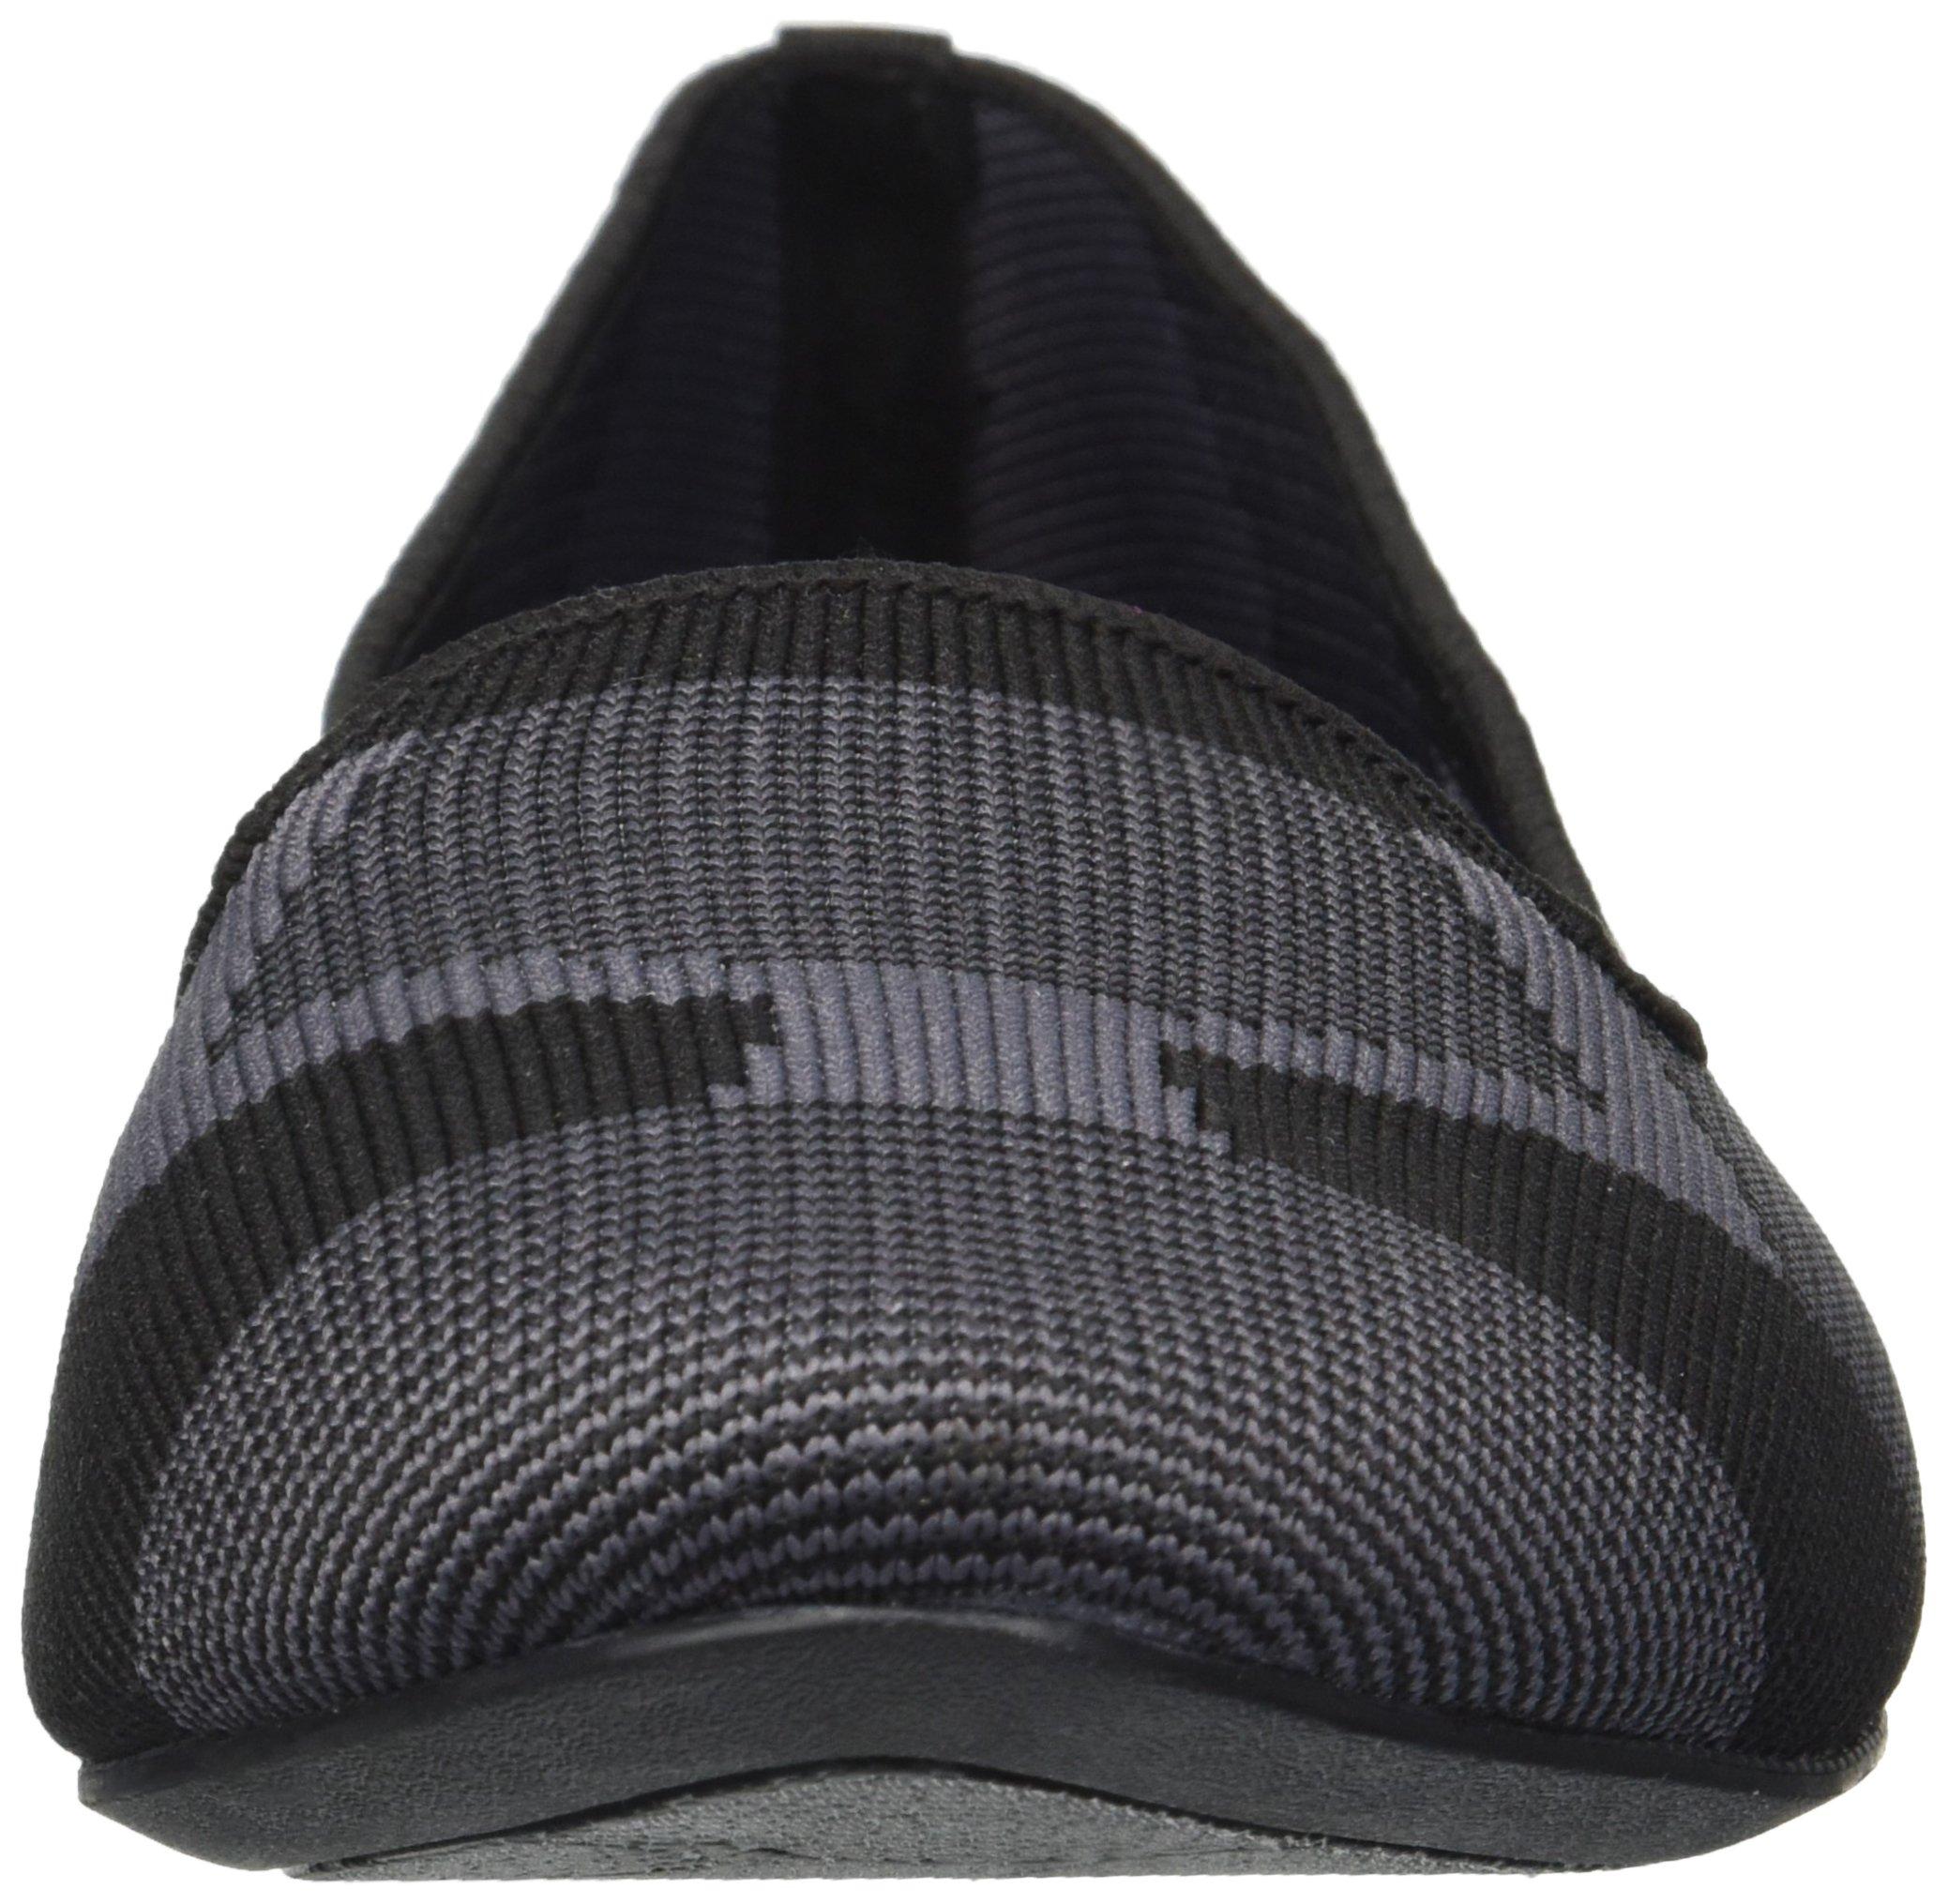 Skechers Women's Cleo-Sherlock-Engineered Knit Loafer Skimmer Ballet Flat, Black, 6.5 M US by Skechers (Image #4)